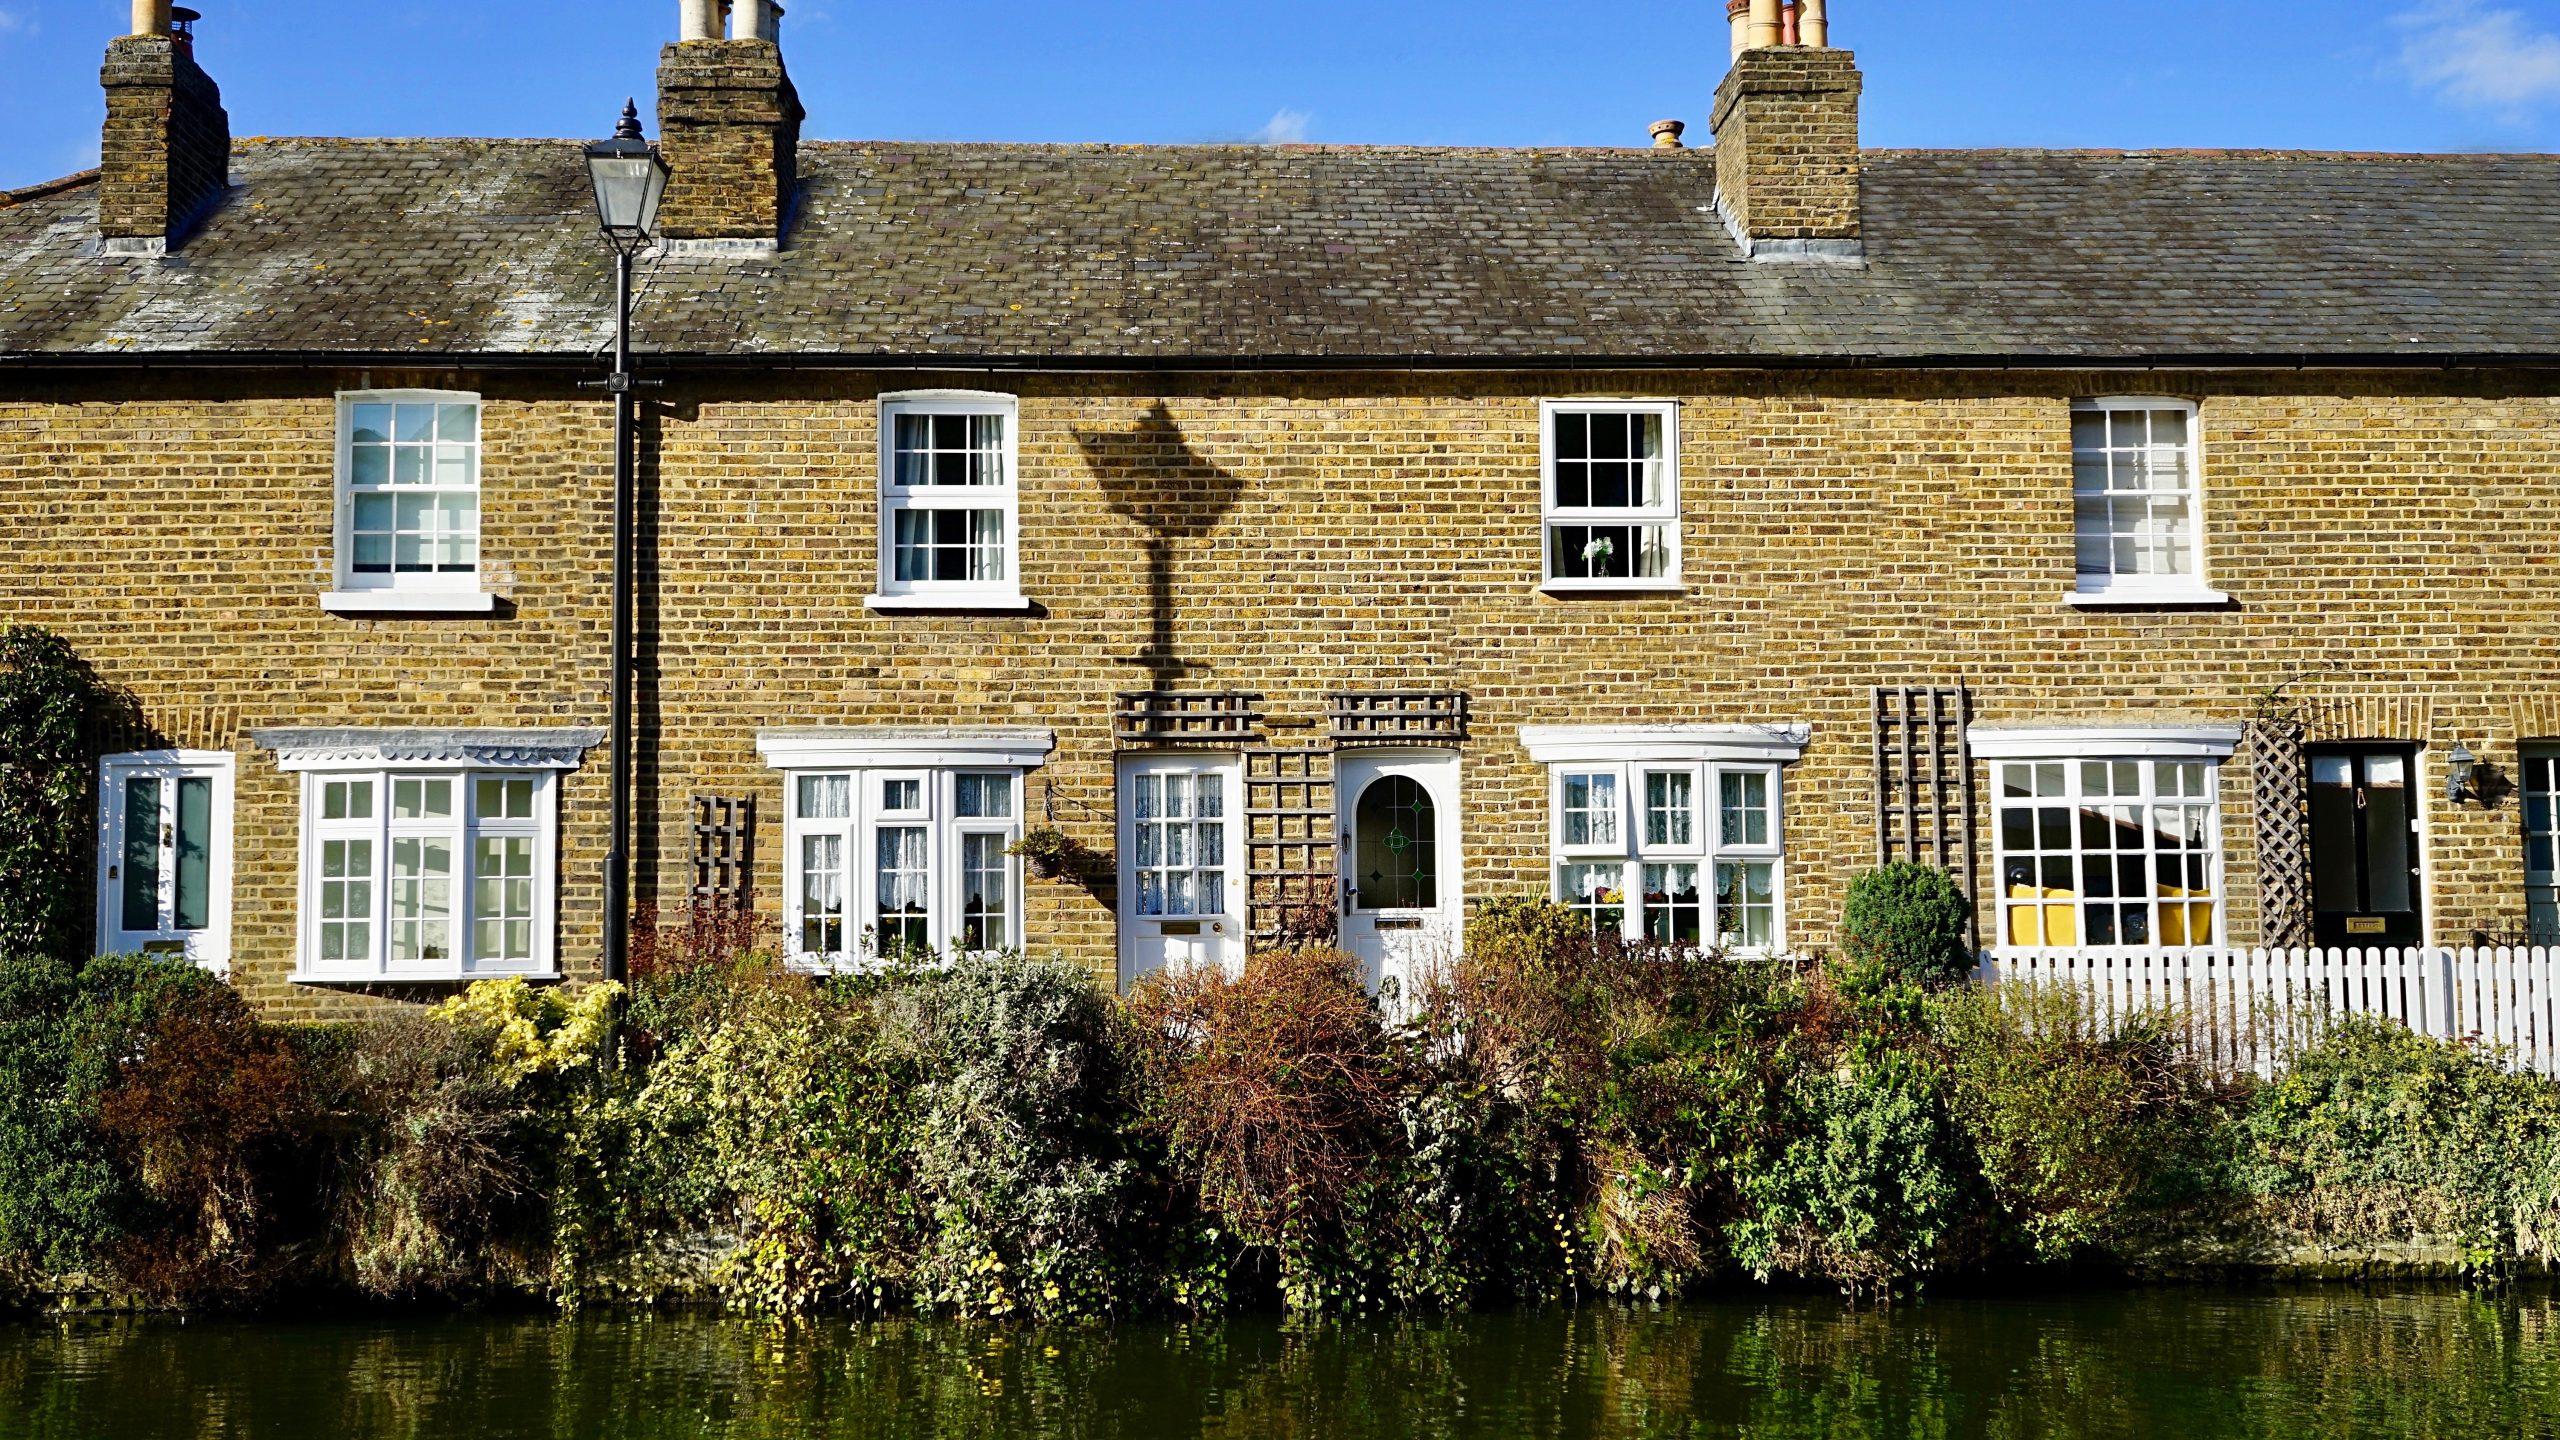 https://lisaslaw.co.uk/wp-content/uploads/2020/09/yellow-and-white-bricked-house-982559-scaled.jpg